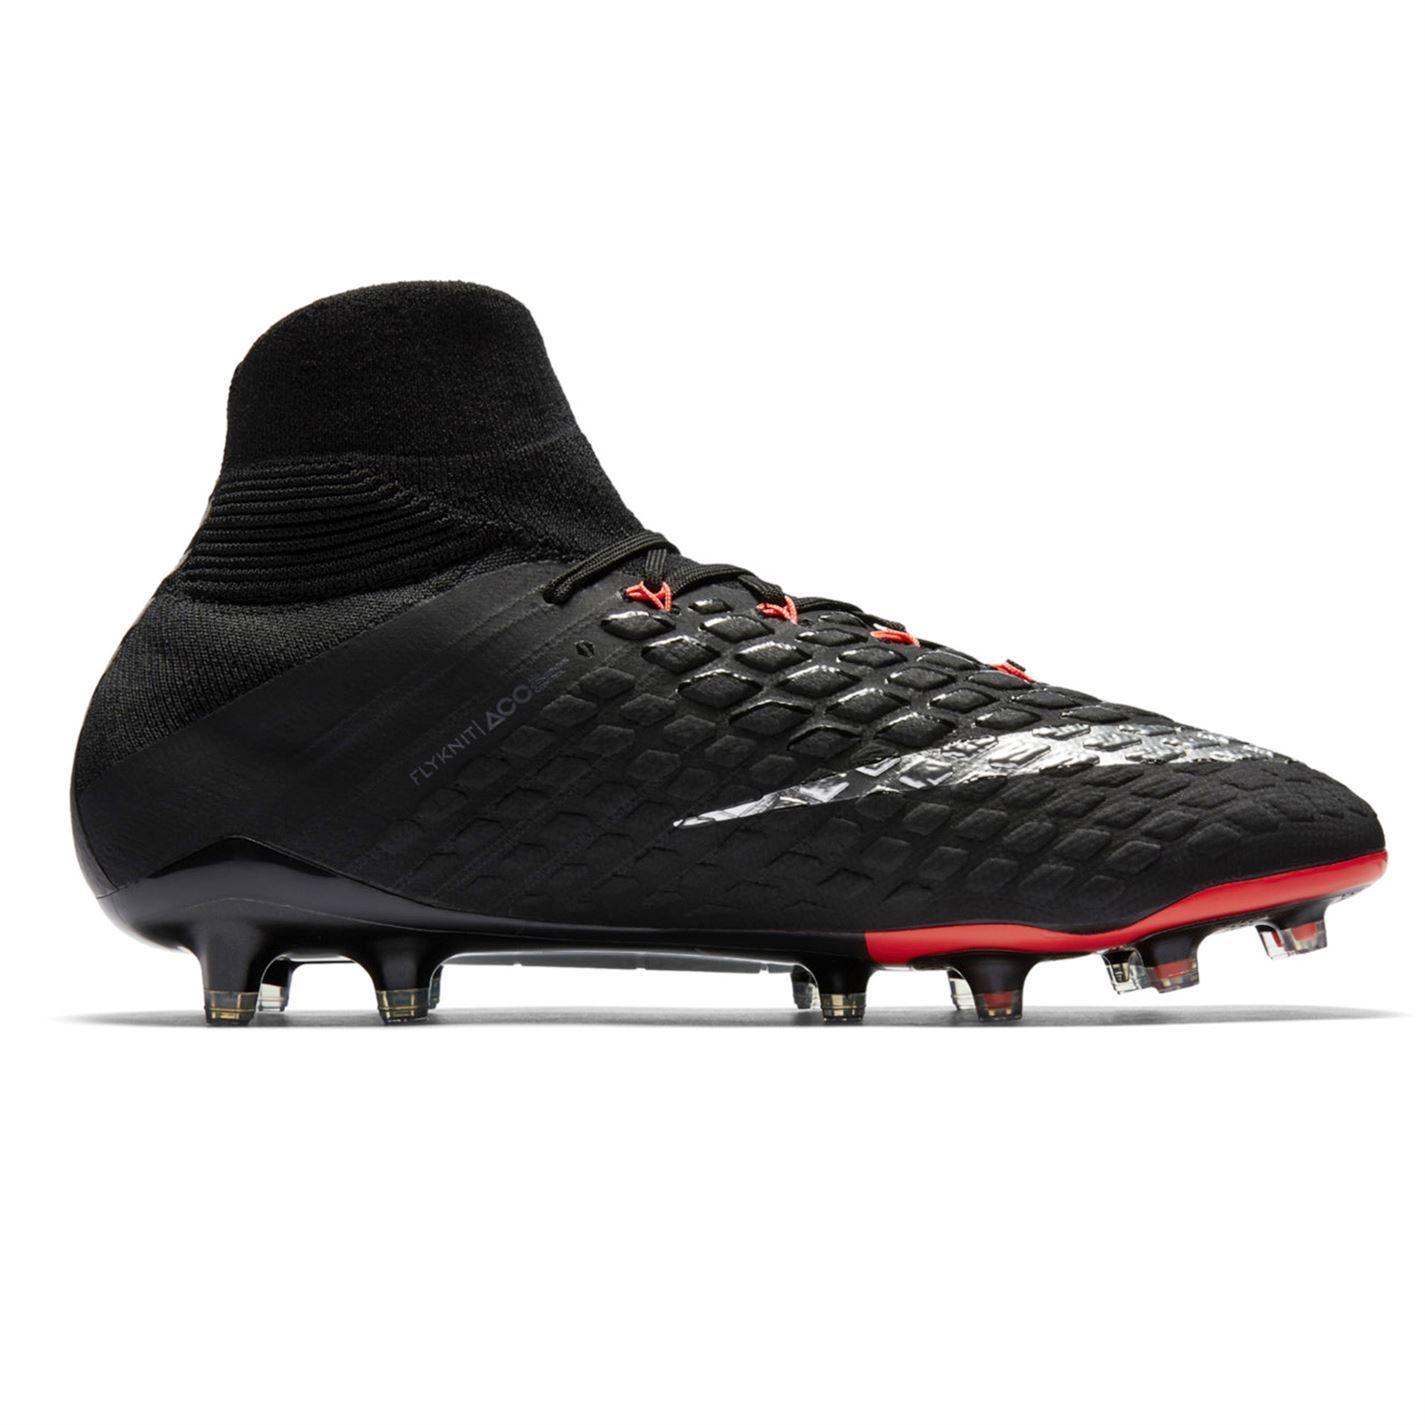 huge selection of 7c109 11556 ... Nike Hypervenom 3 Elite Dynamic Fit FG Football Boots Mens Black Soccer  Cleats